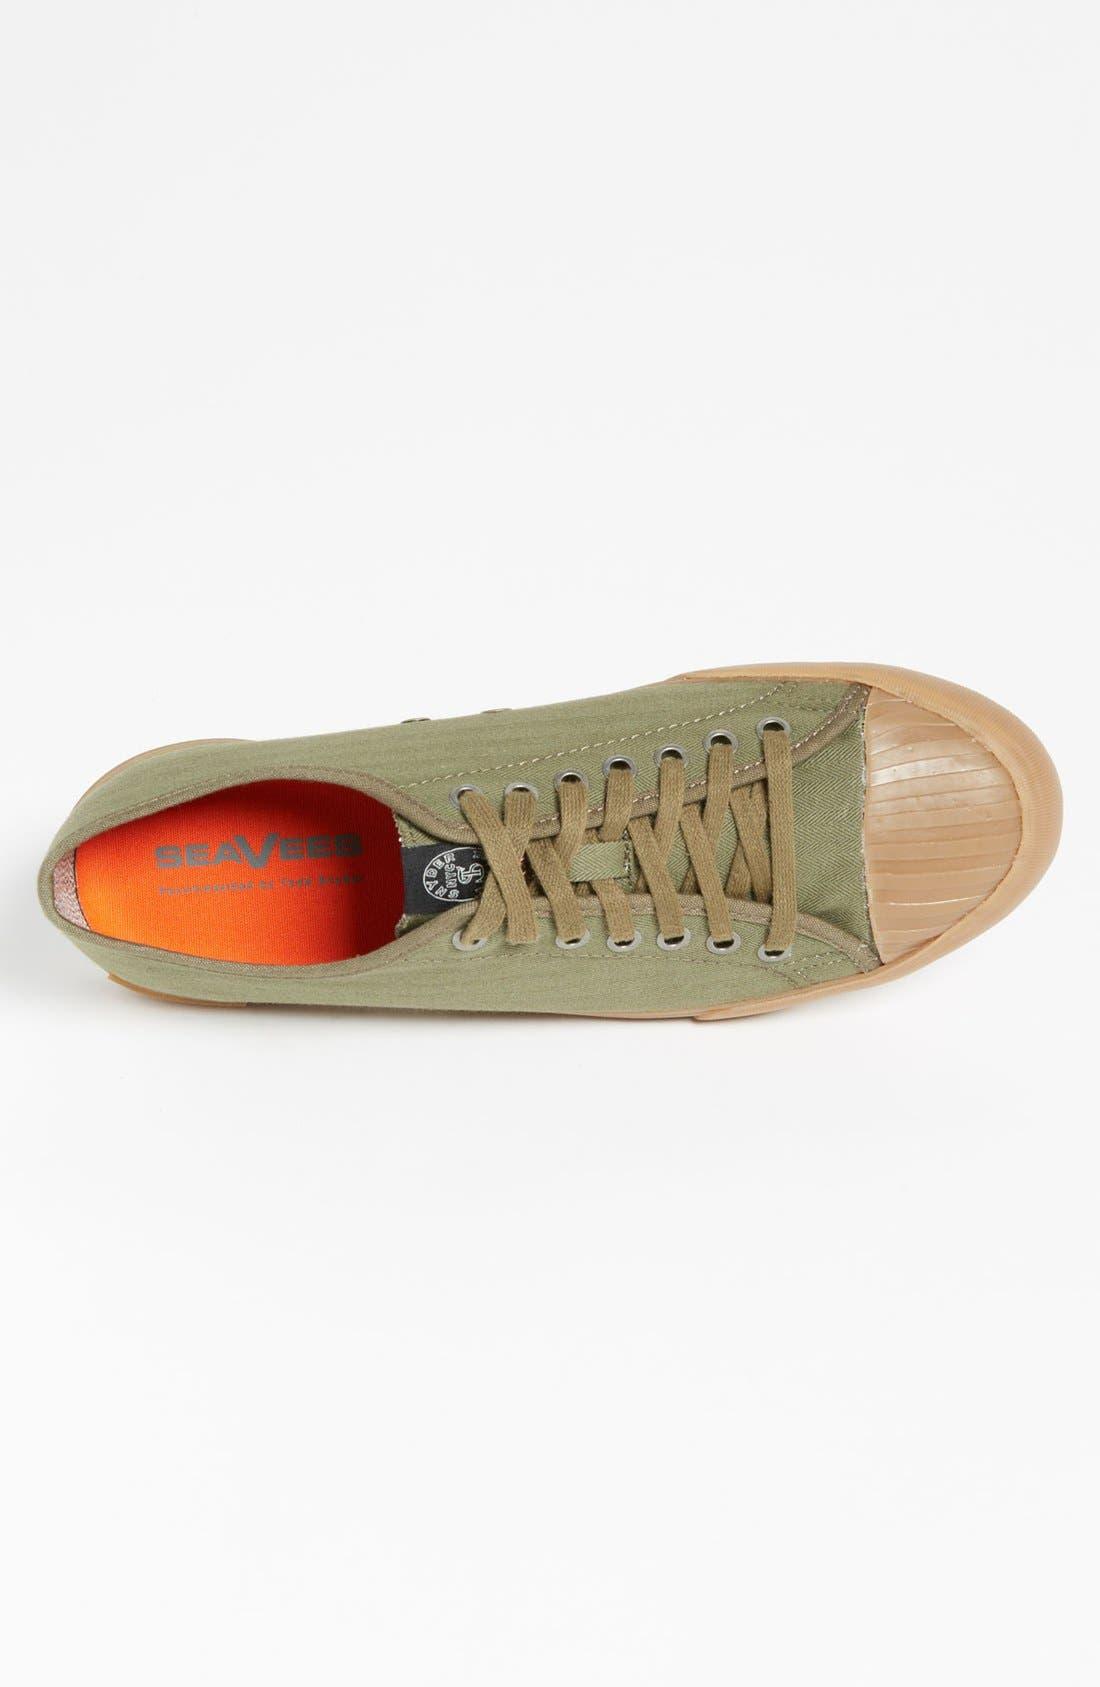 Alternate Image 3  - SeaVees '08/61 Army Issue' Low Sneaker